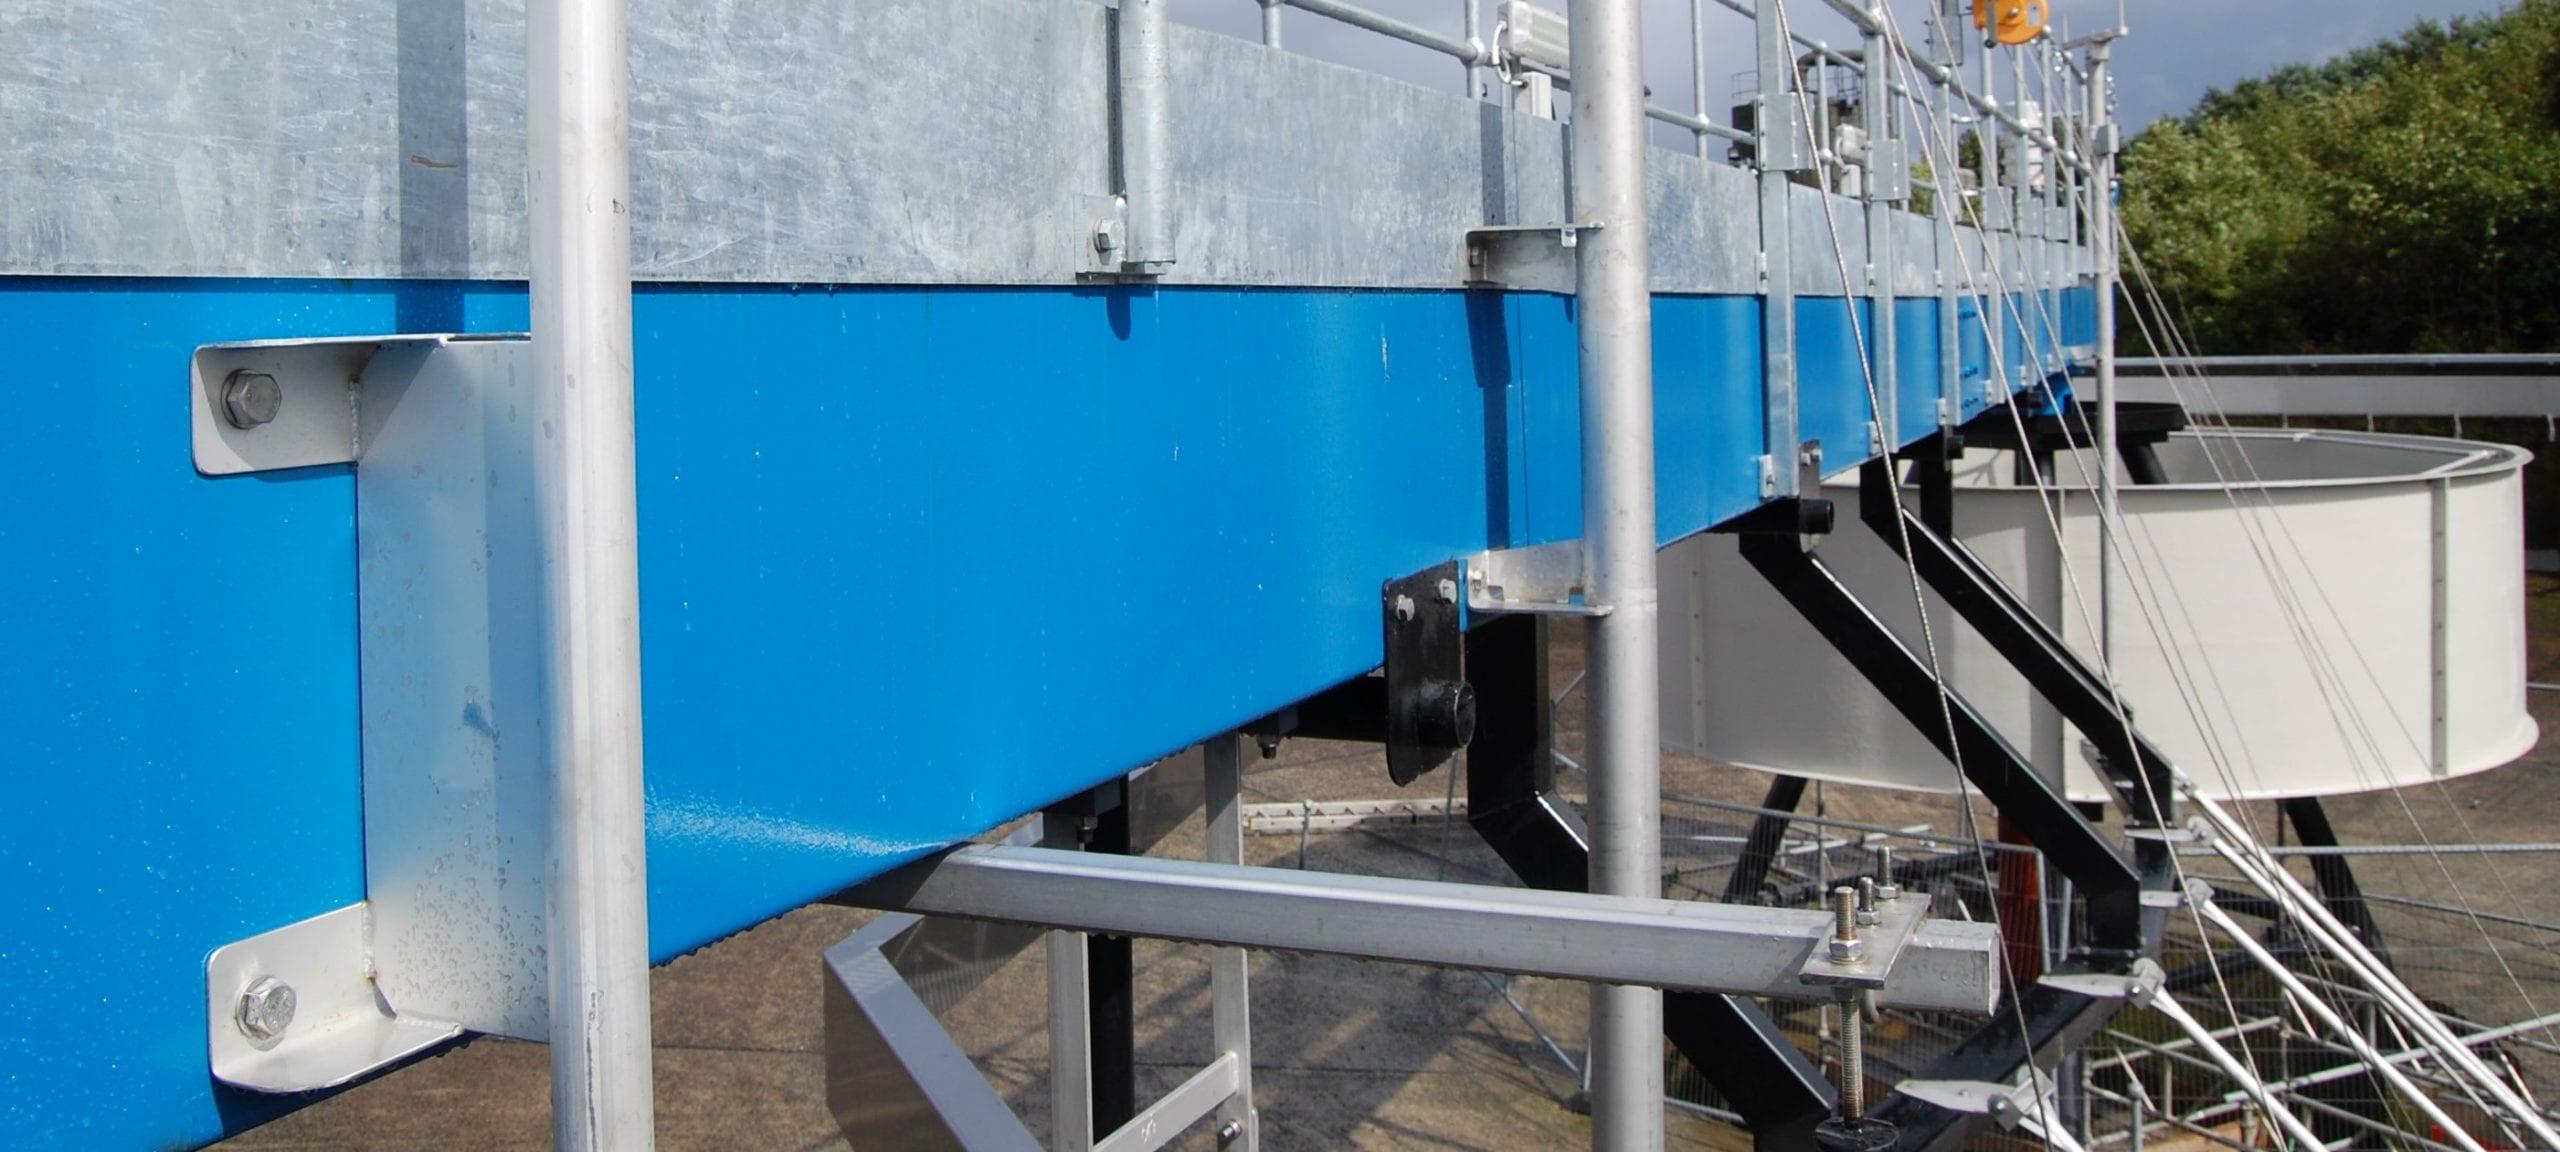 Culmore Waste Water Treatment Works (WwTW) Image